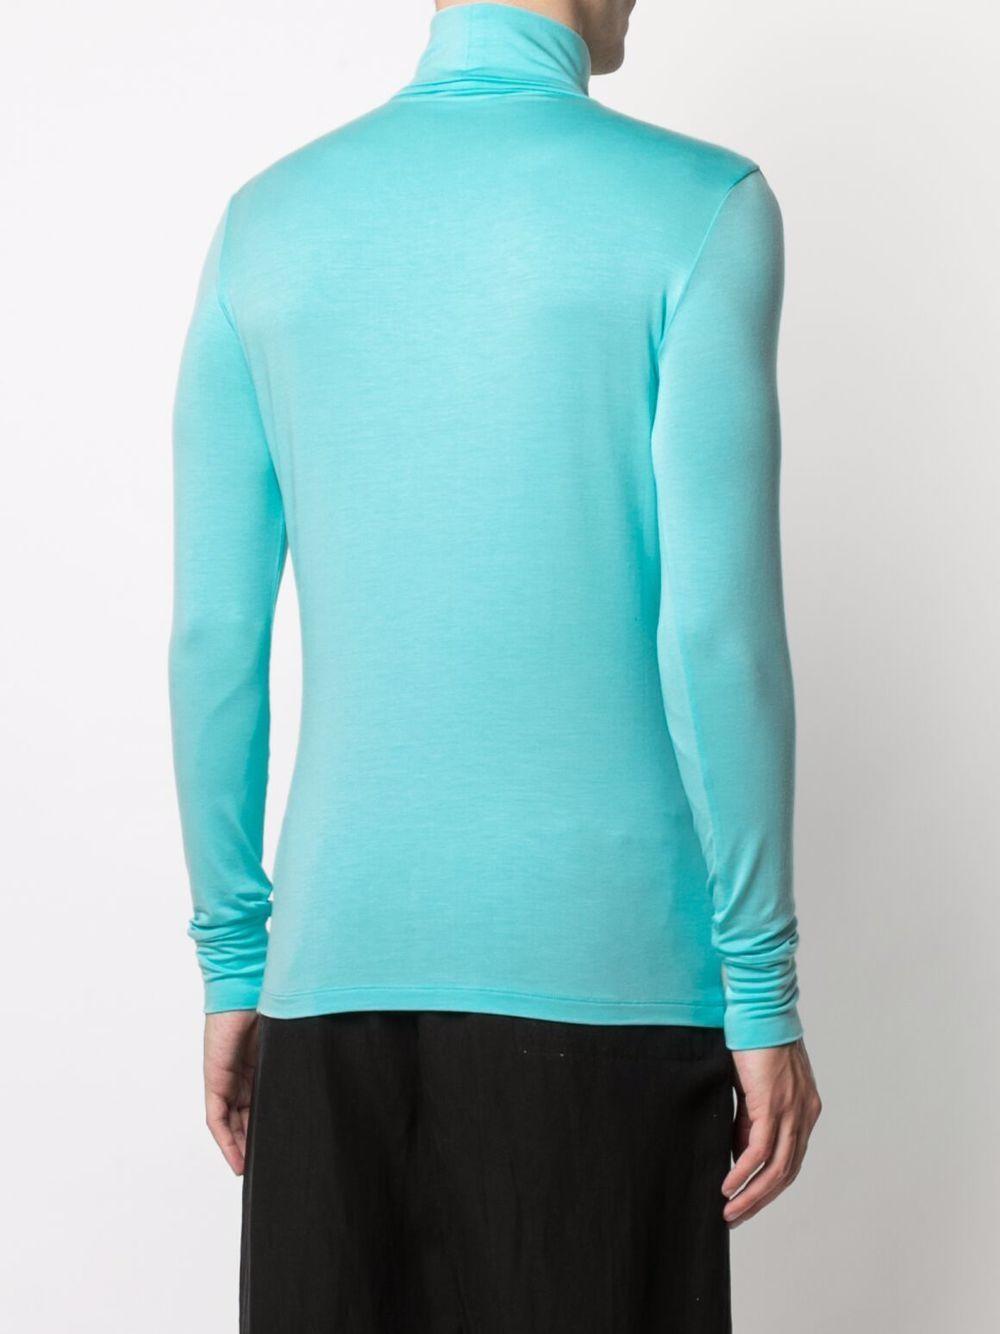 Raf simons maglione con stampa uomo blue RAF SIMONS | Maglie | 211M149190160040